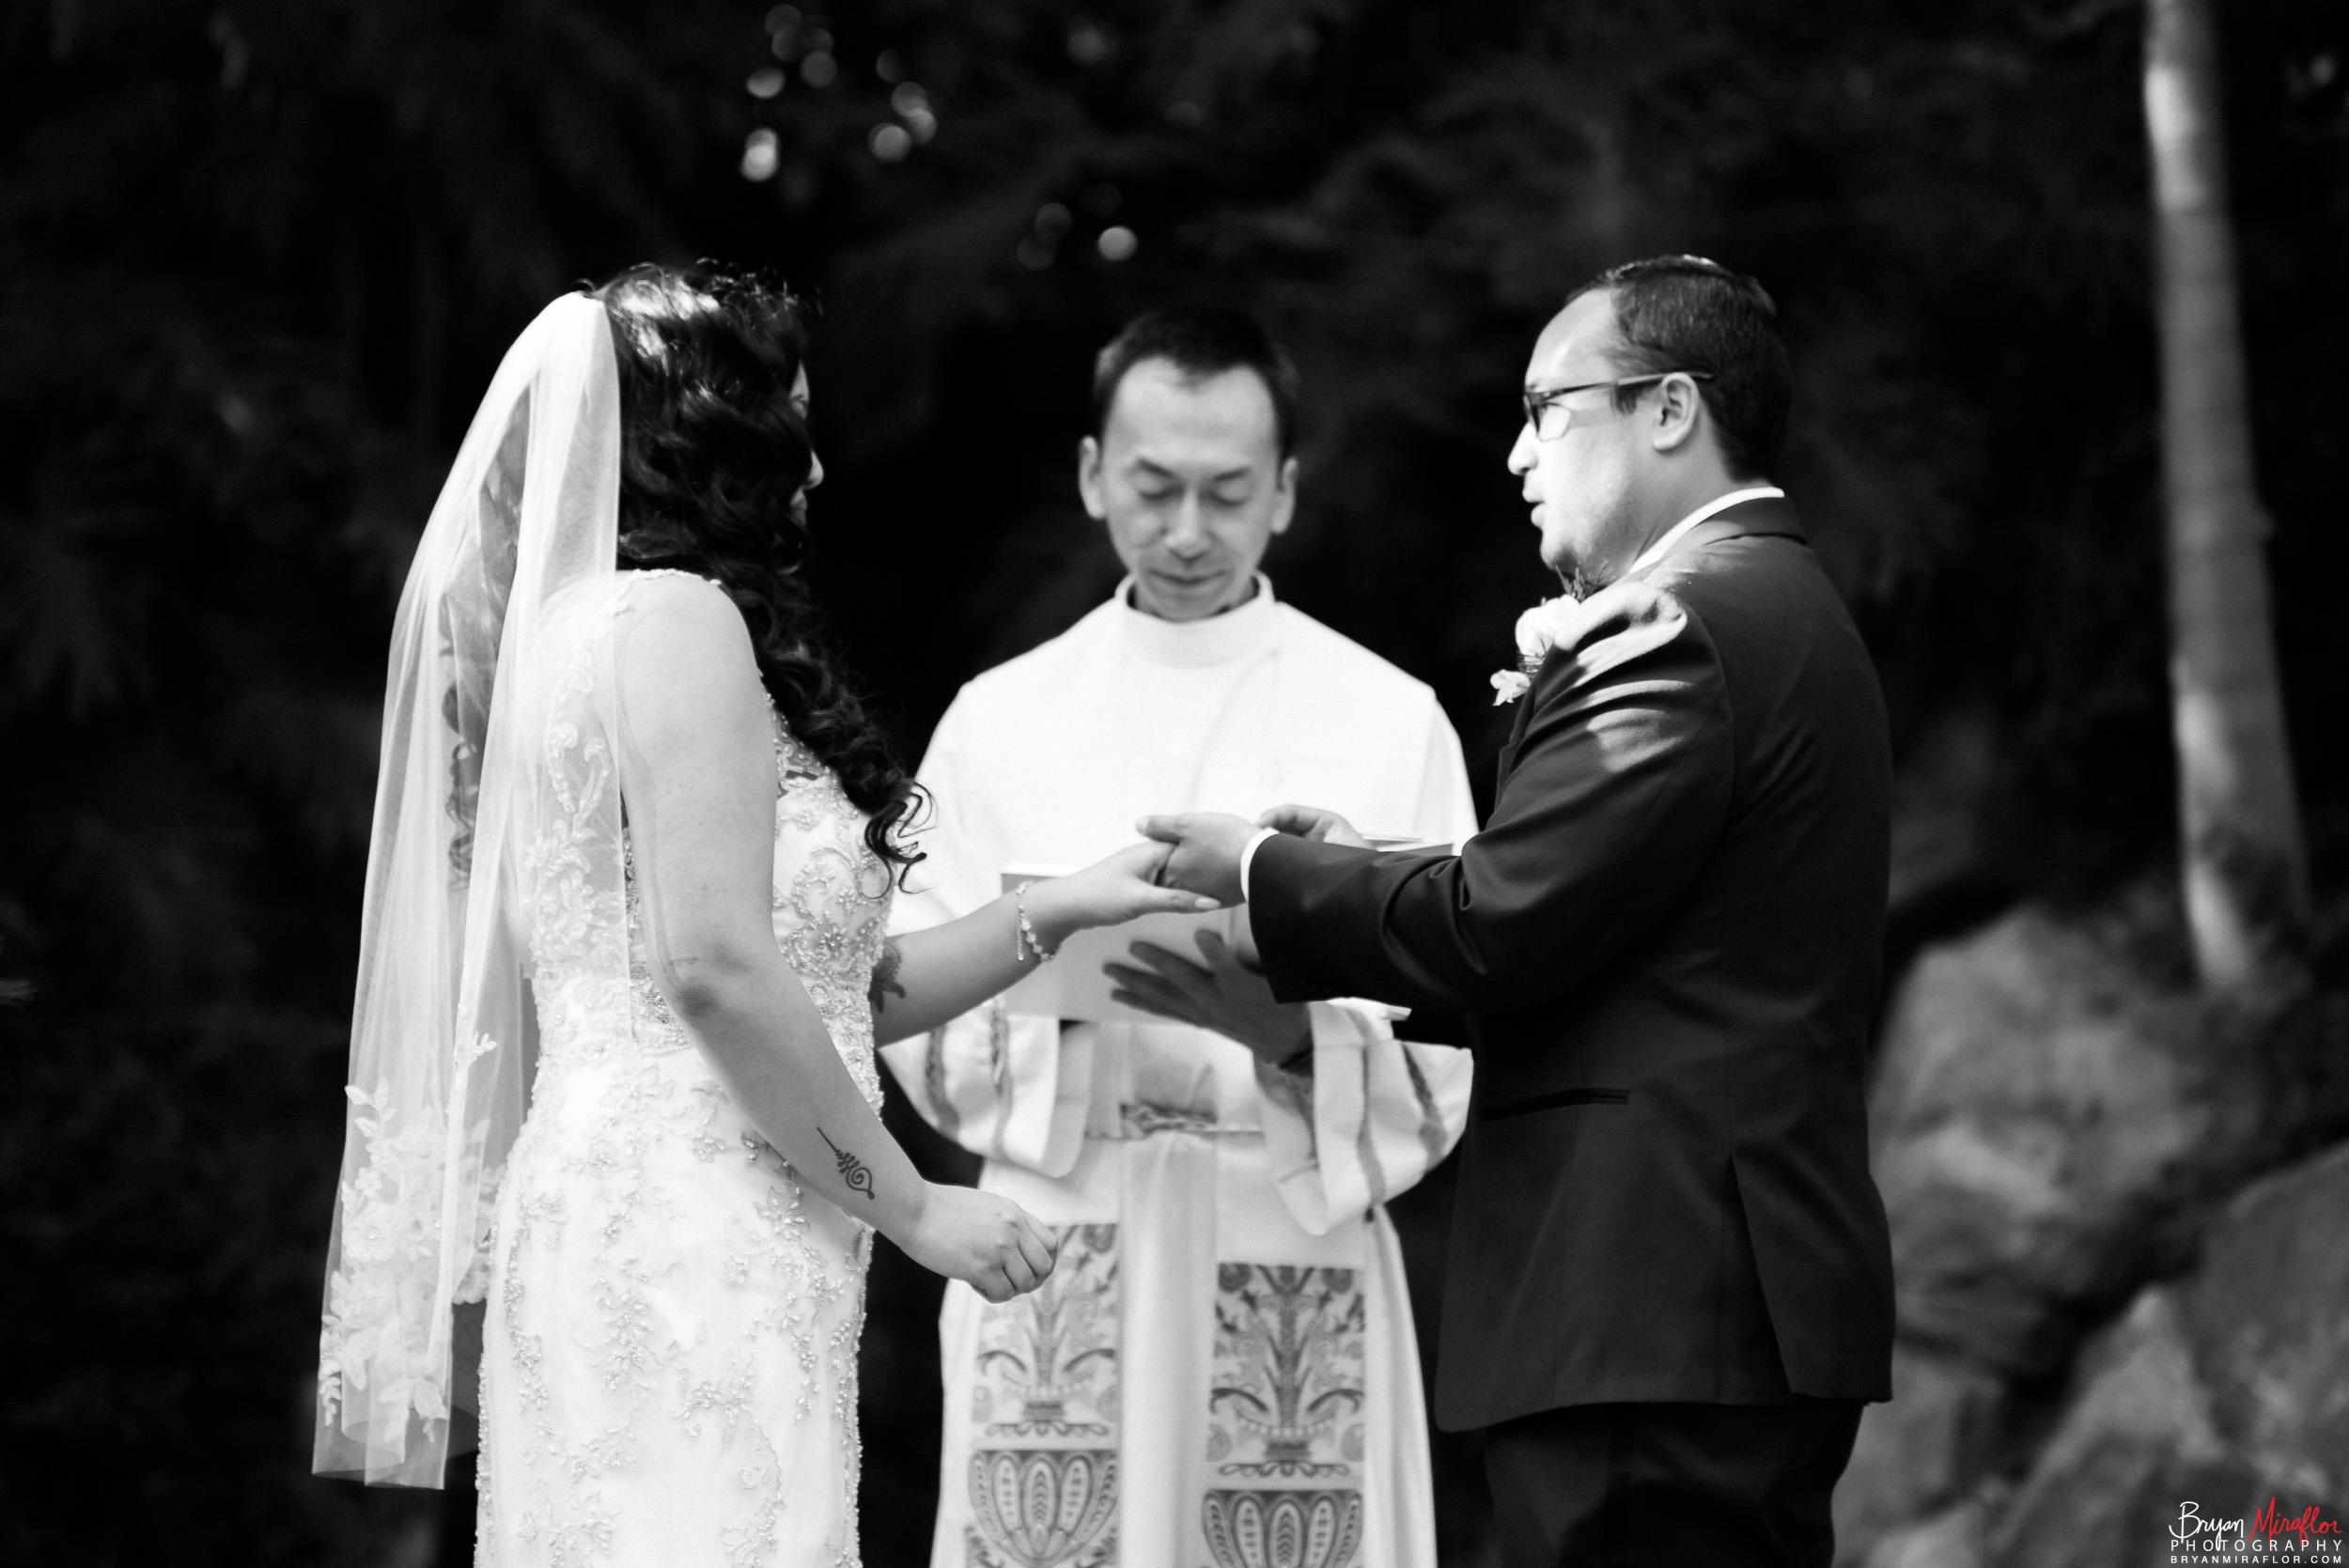 Bryan-Miraflor-Photography-Hannah-Jonathan-Married-Grand-Traditions-Estate-Gardens-Fallbrook-20171222-101.jpg